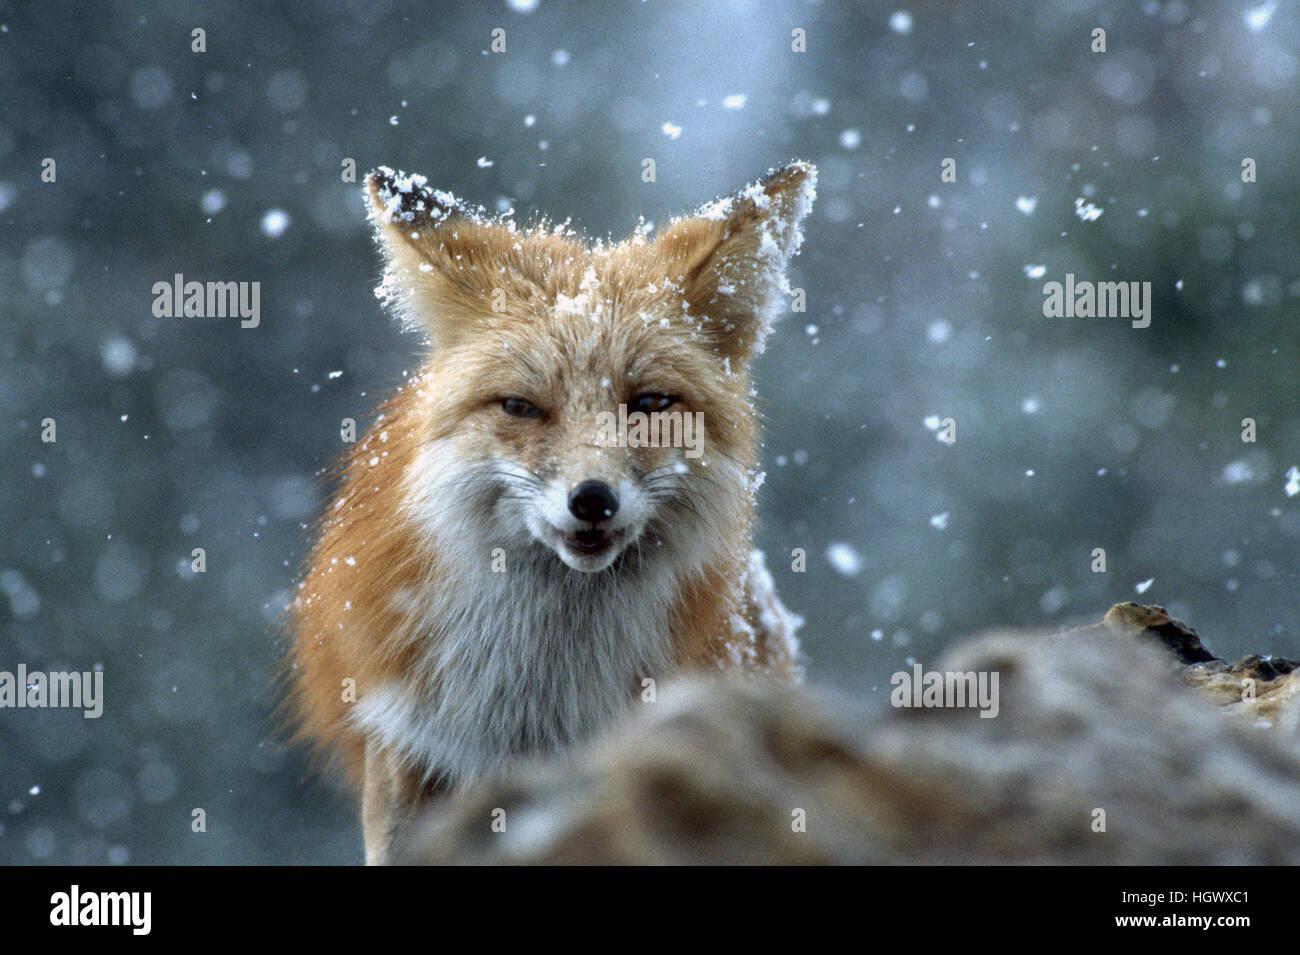 Fuchs mit bedrohlichen Blick Stockbild